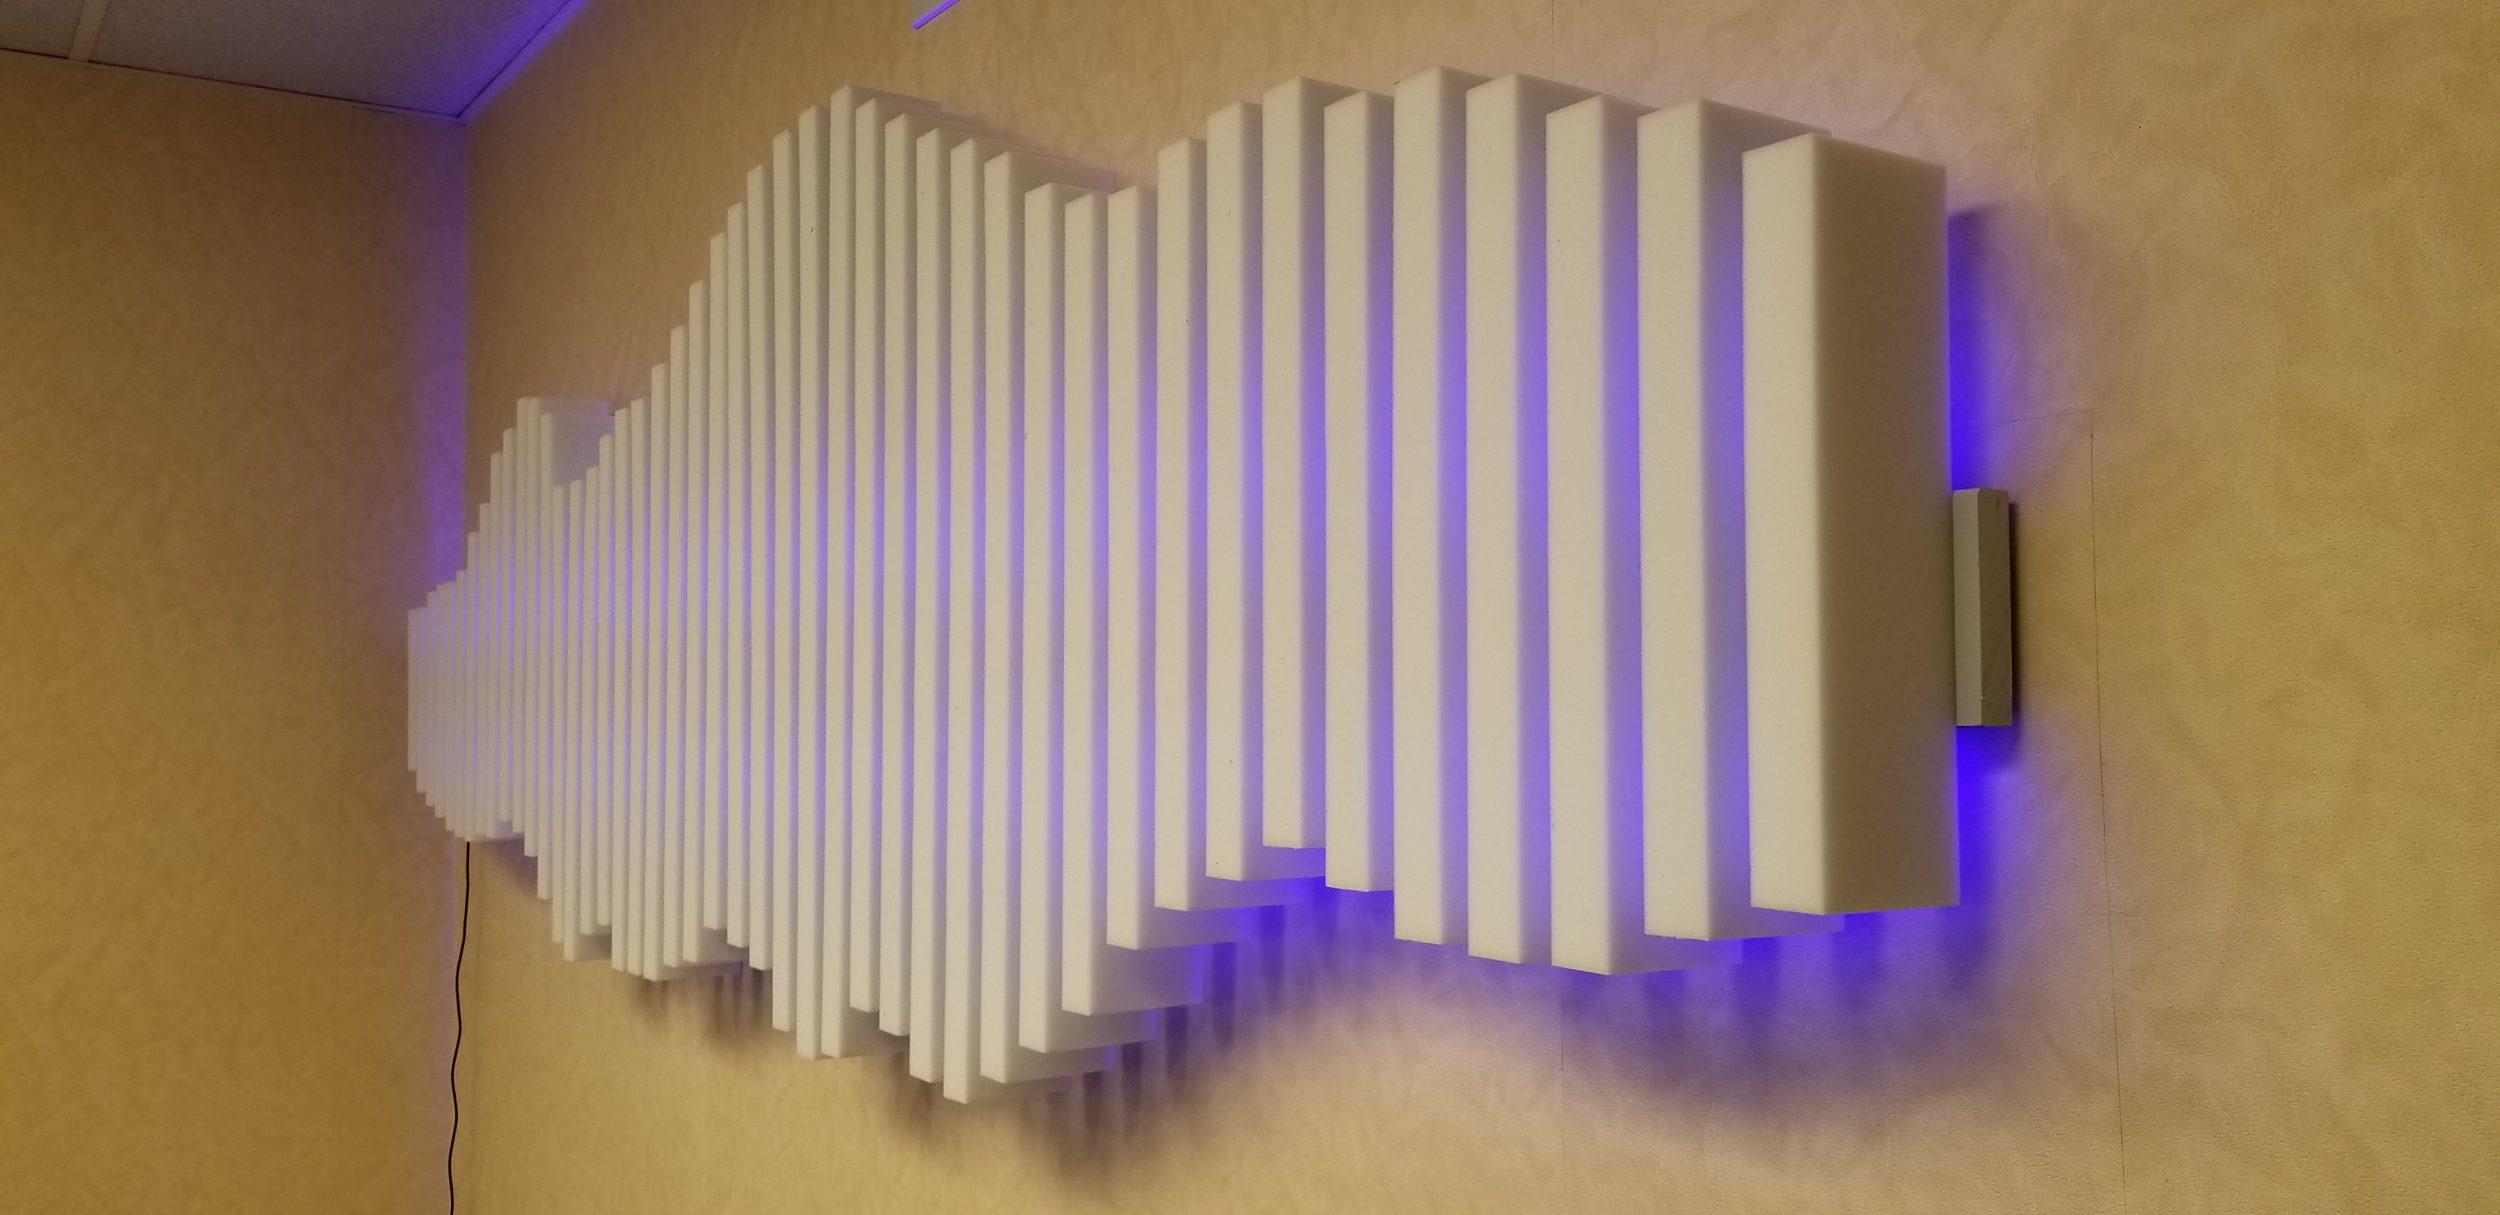 LED Sound Bar Project